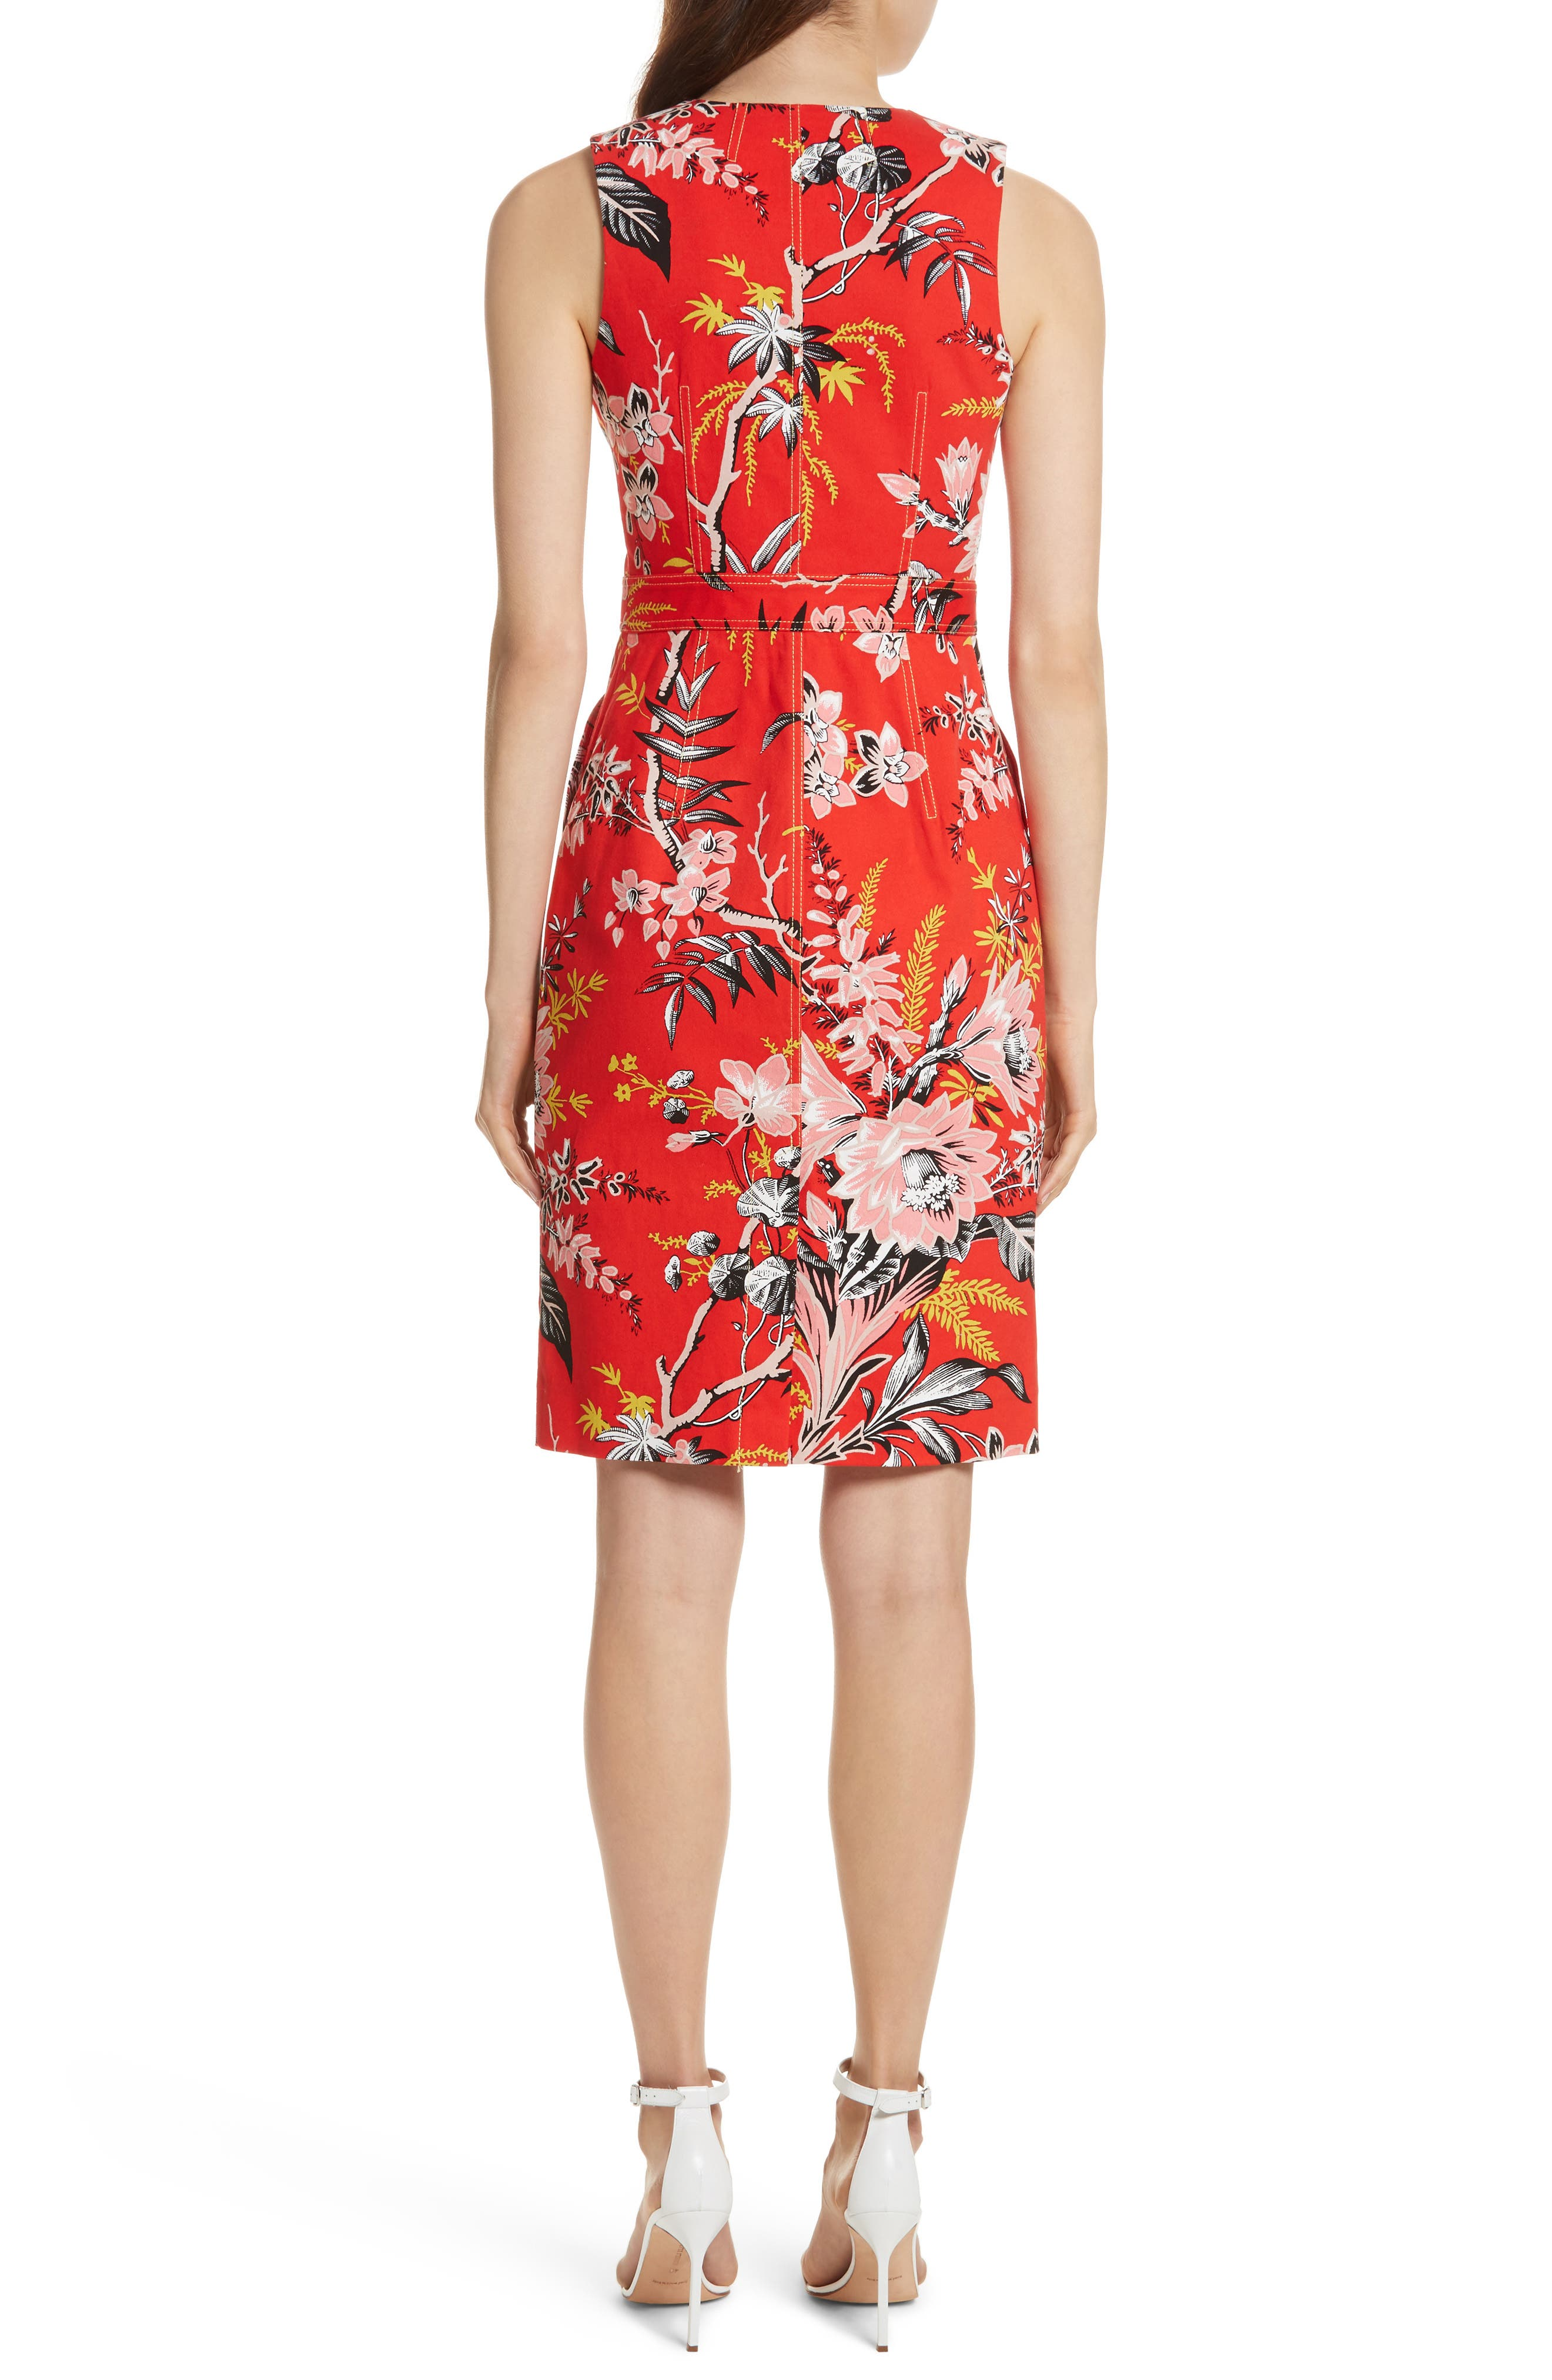 Diane von Furstenberg Floral Zip Front Stretch Cotton Sheath Dress,                             Alternate thumbnail 2, color,                             Avalon Poppy